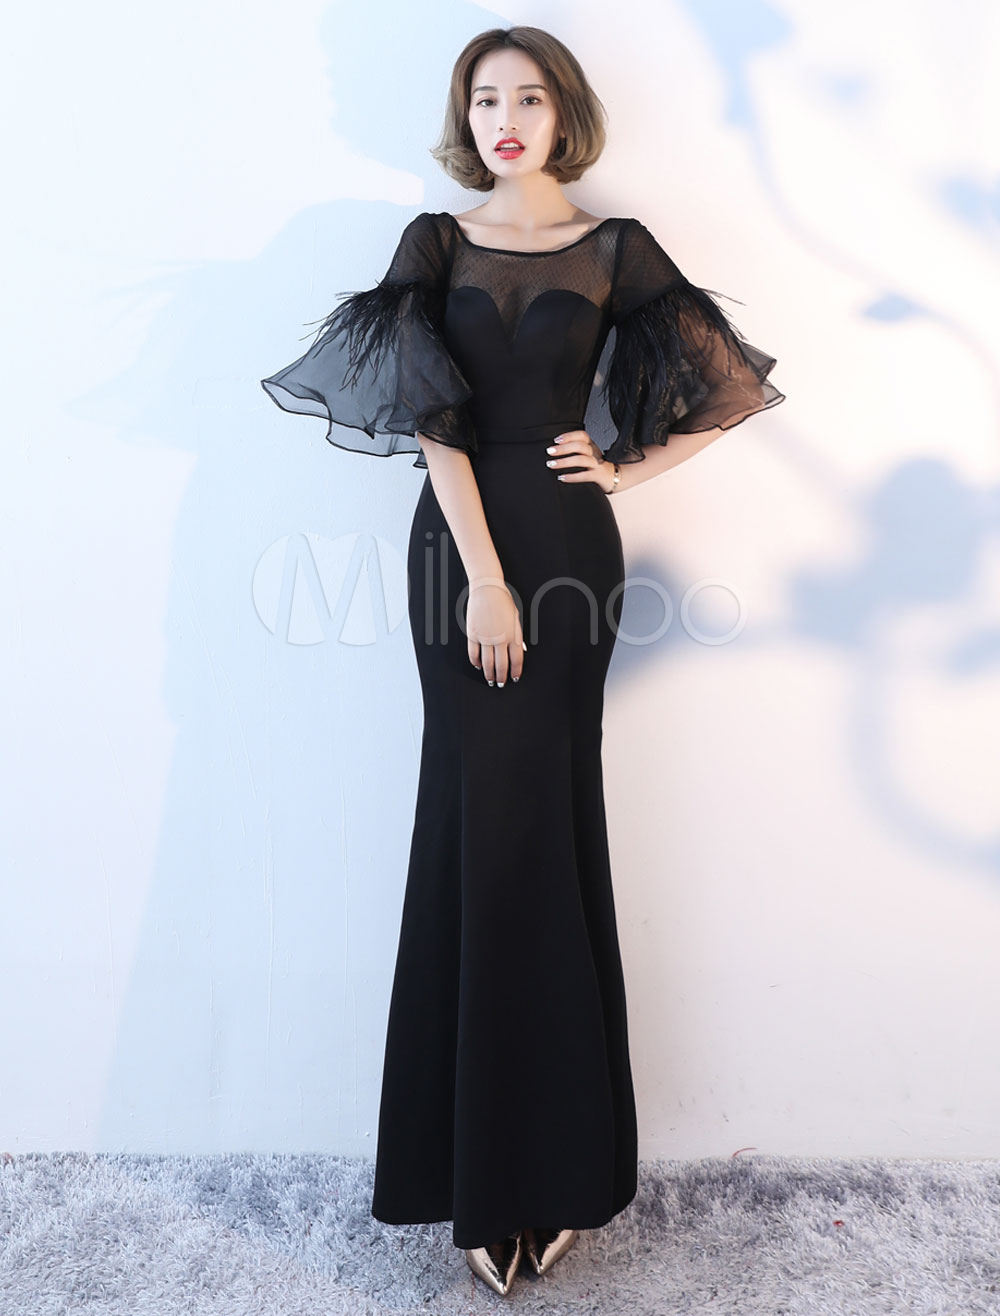 372567f97e3fa ... Black Evening Dresses Long Bell Sleeve Illusion Satin Mermaid Formal  Dress-No.8. 12. 35%OFF. Color:Black